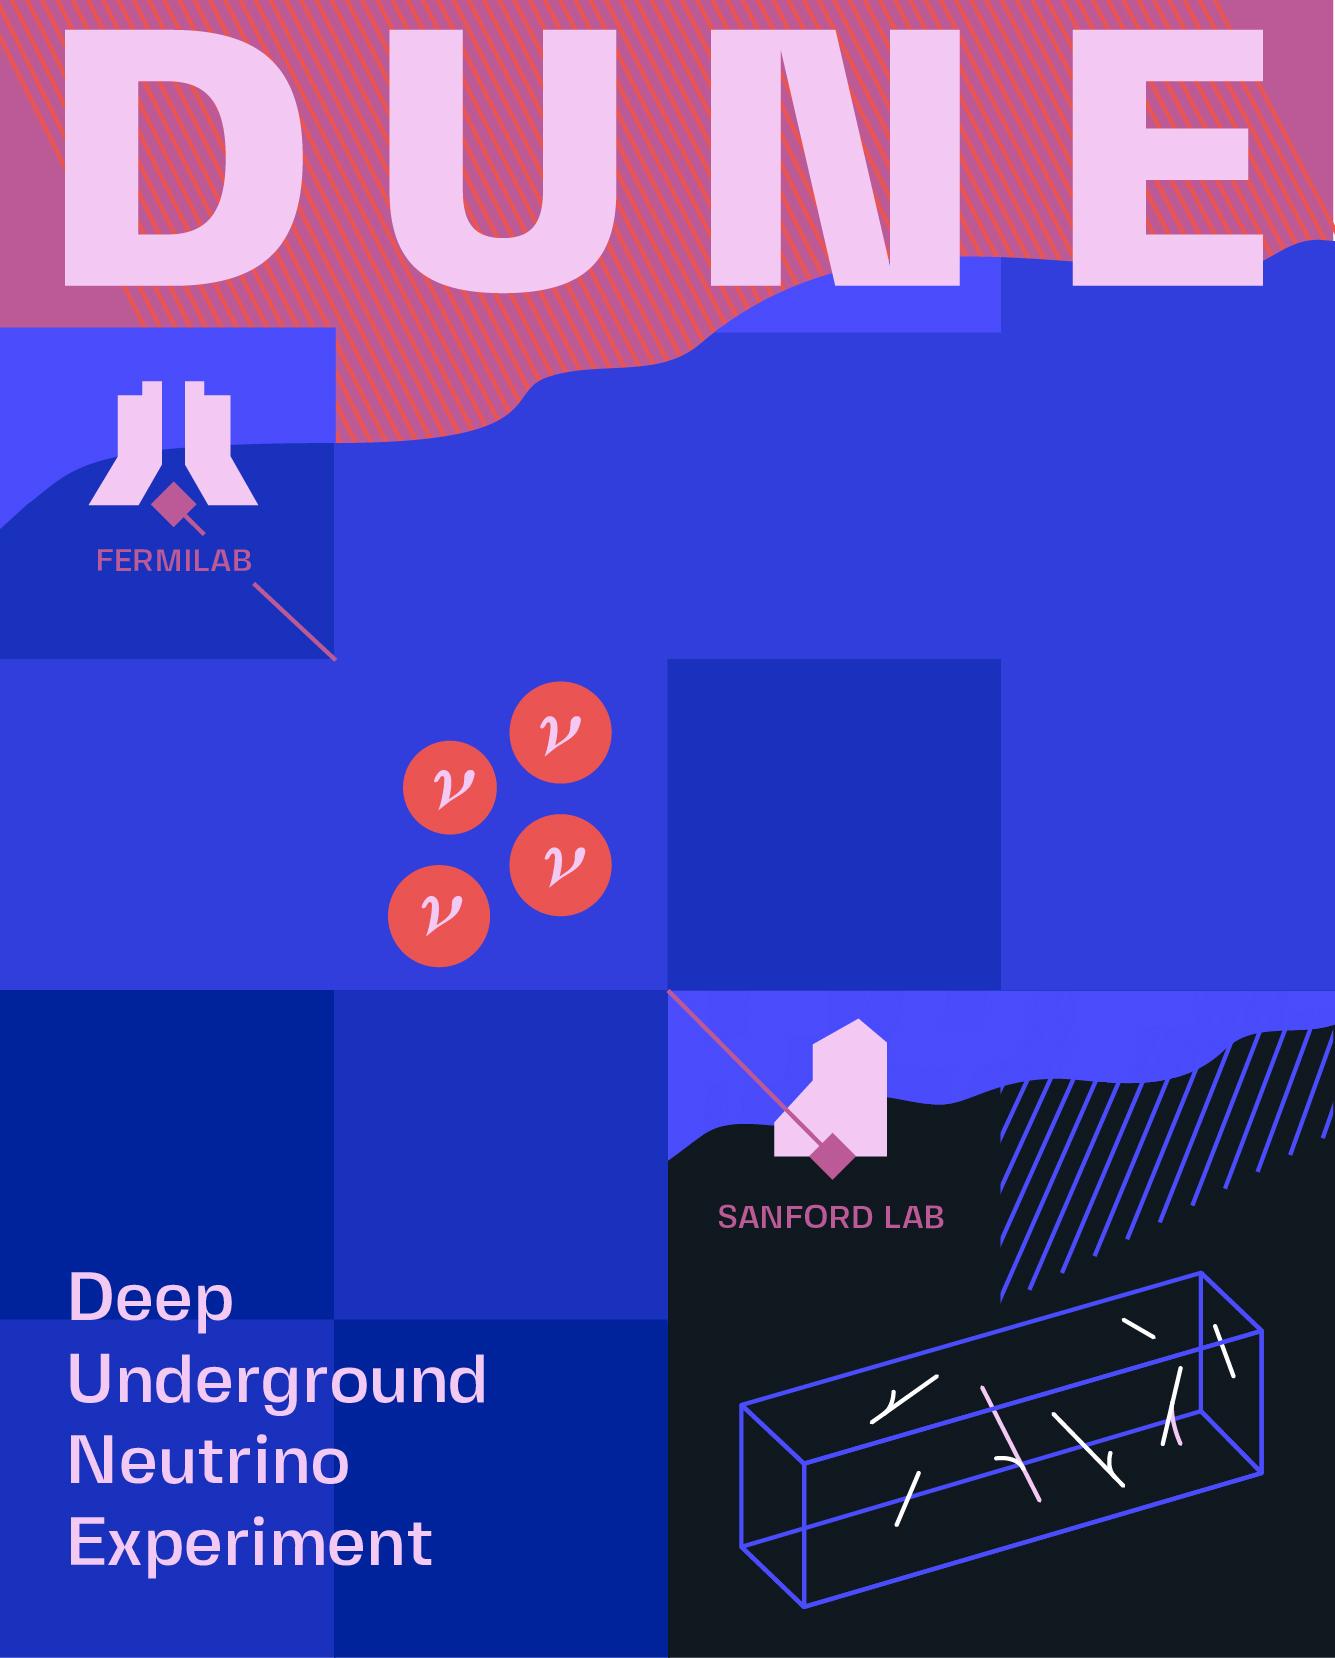 DUNE: Deep Underground Neutrino Experiment